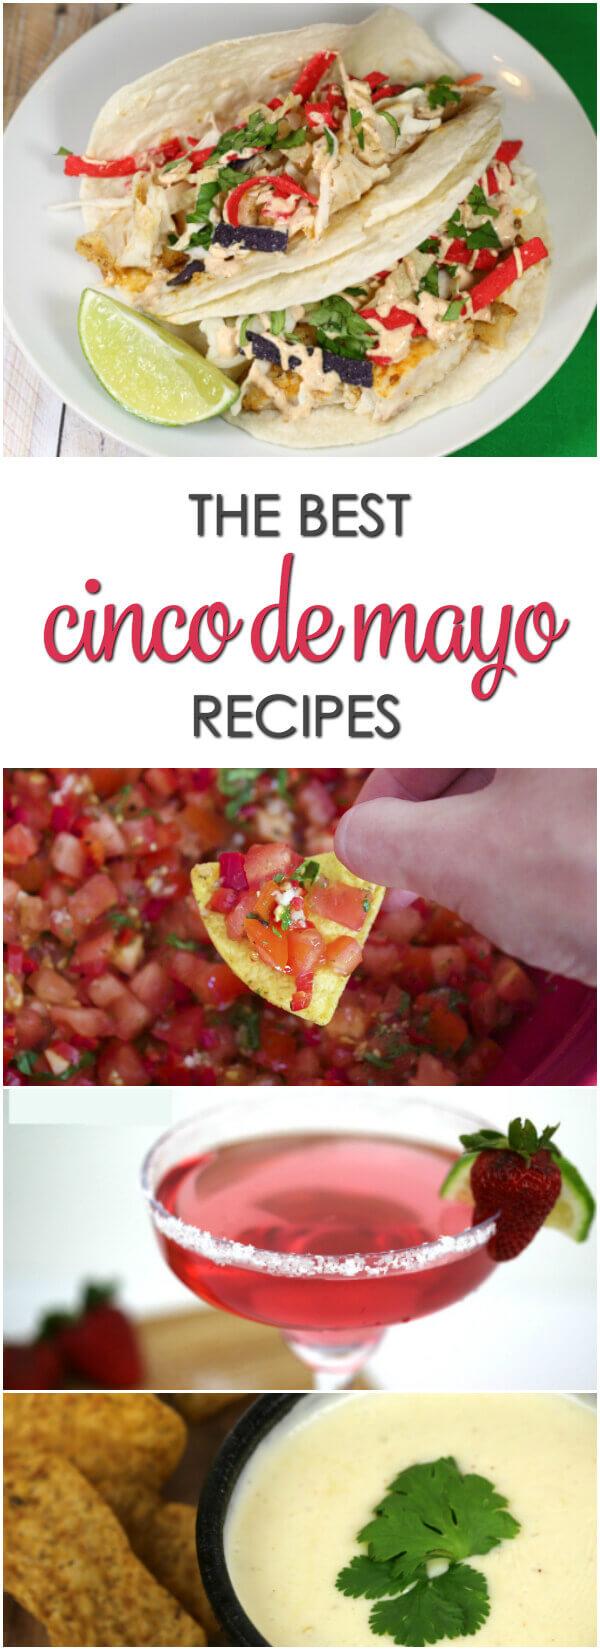 The Best Cinco de Mayo easy recipes